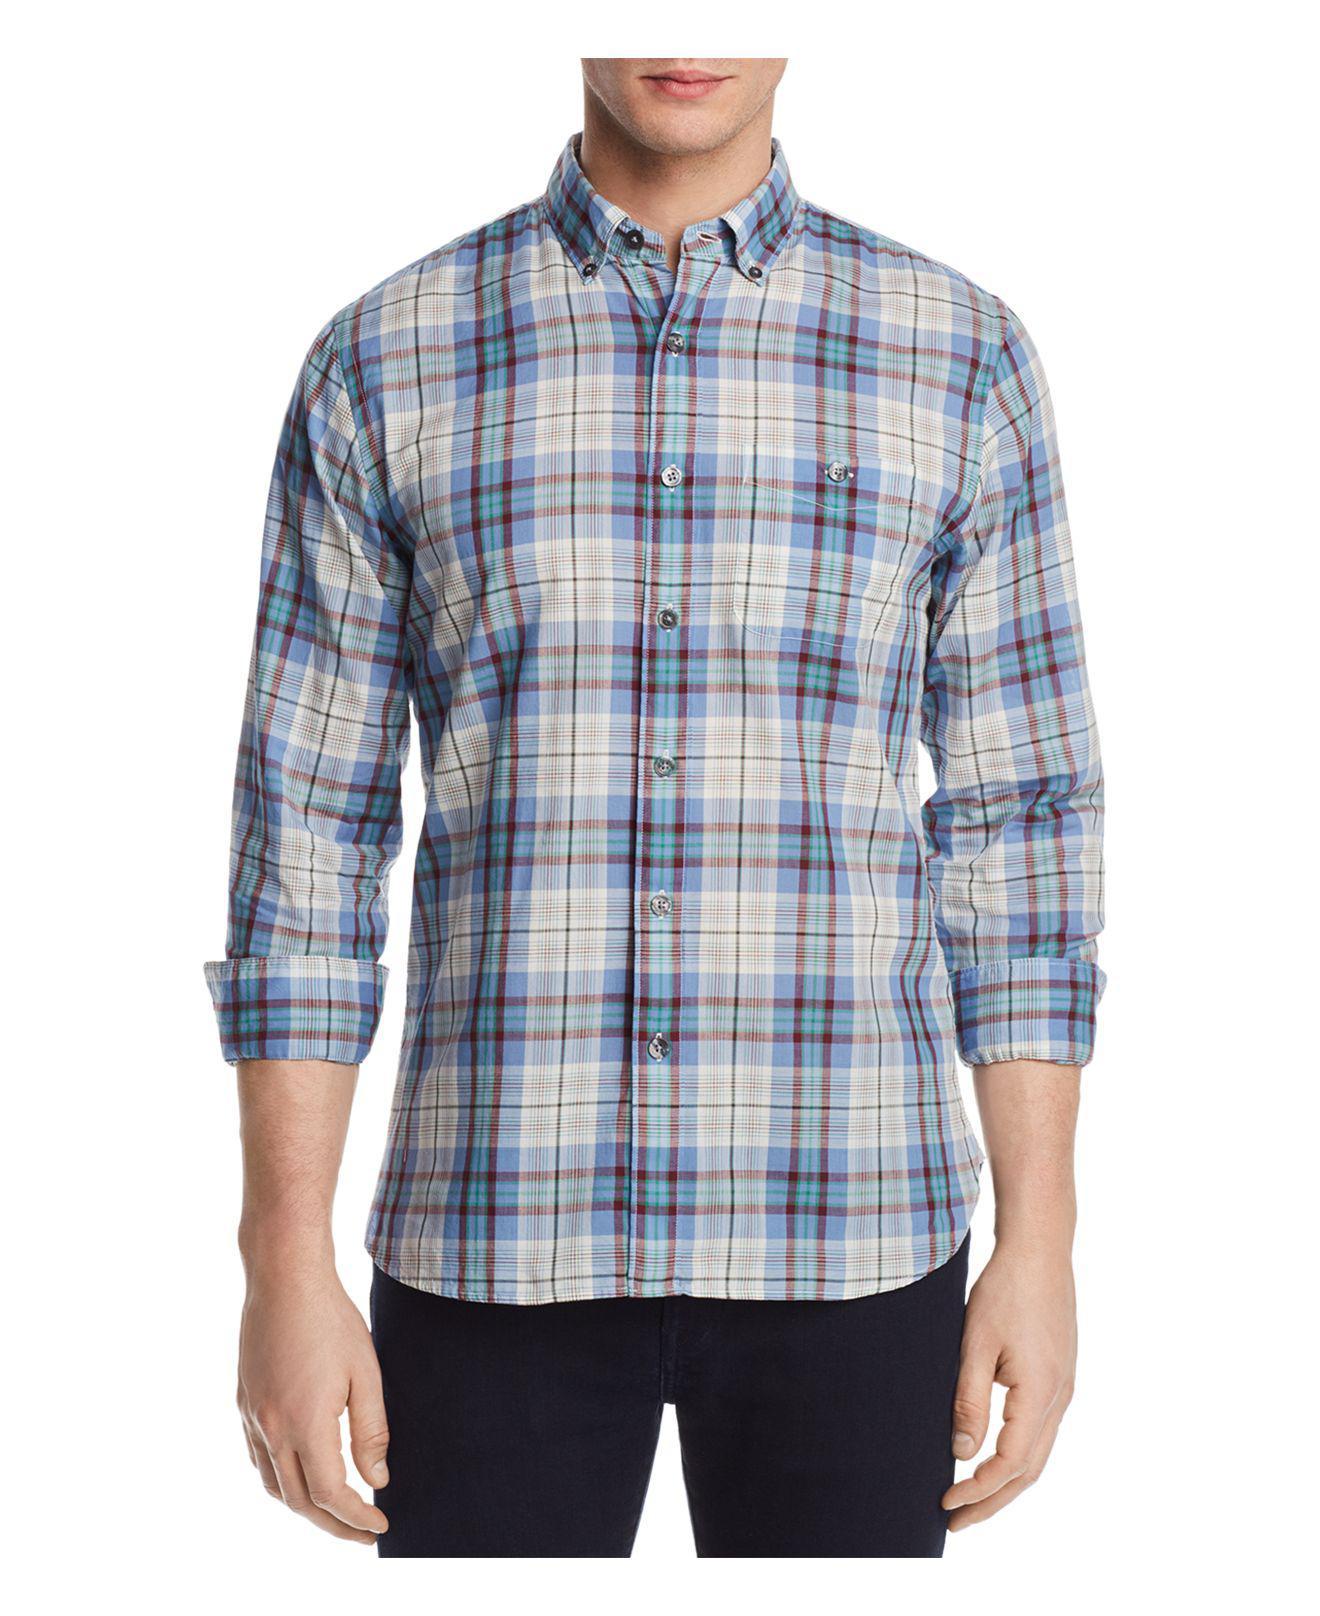 Mens Plaid Poplin Shirt Todd Snyder Cheap With Mastercard LnvtLd